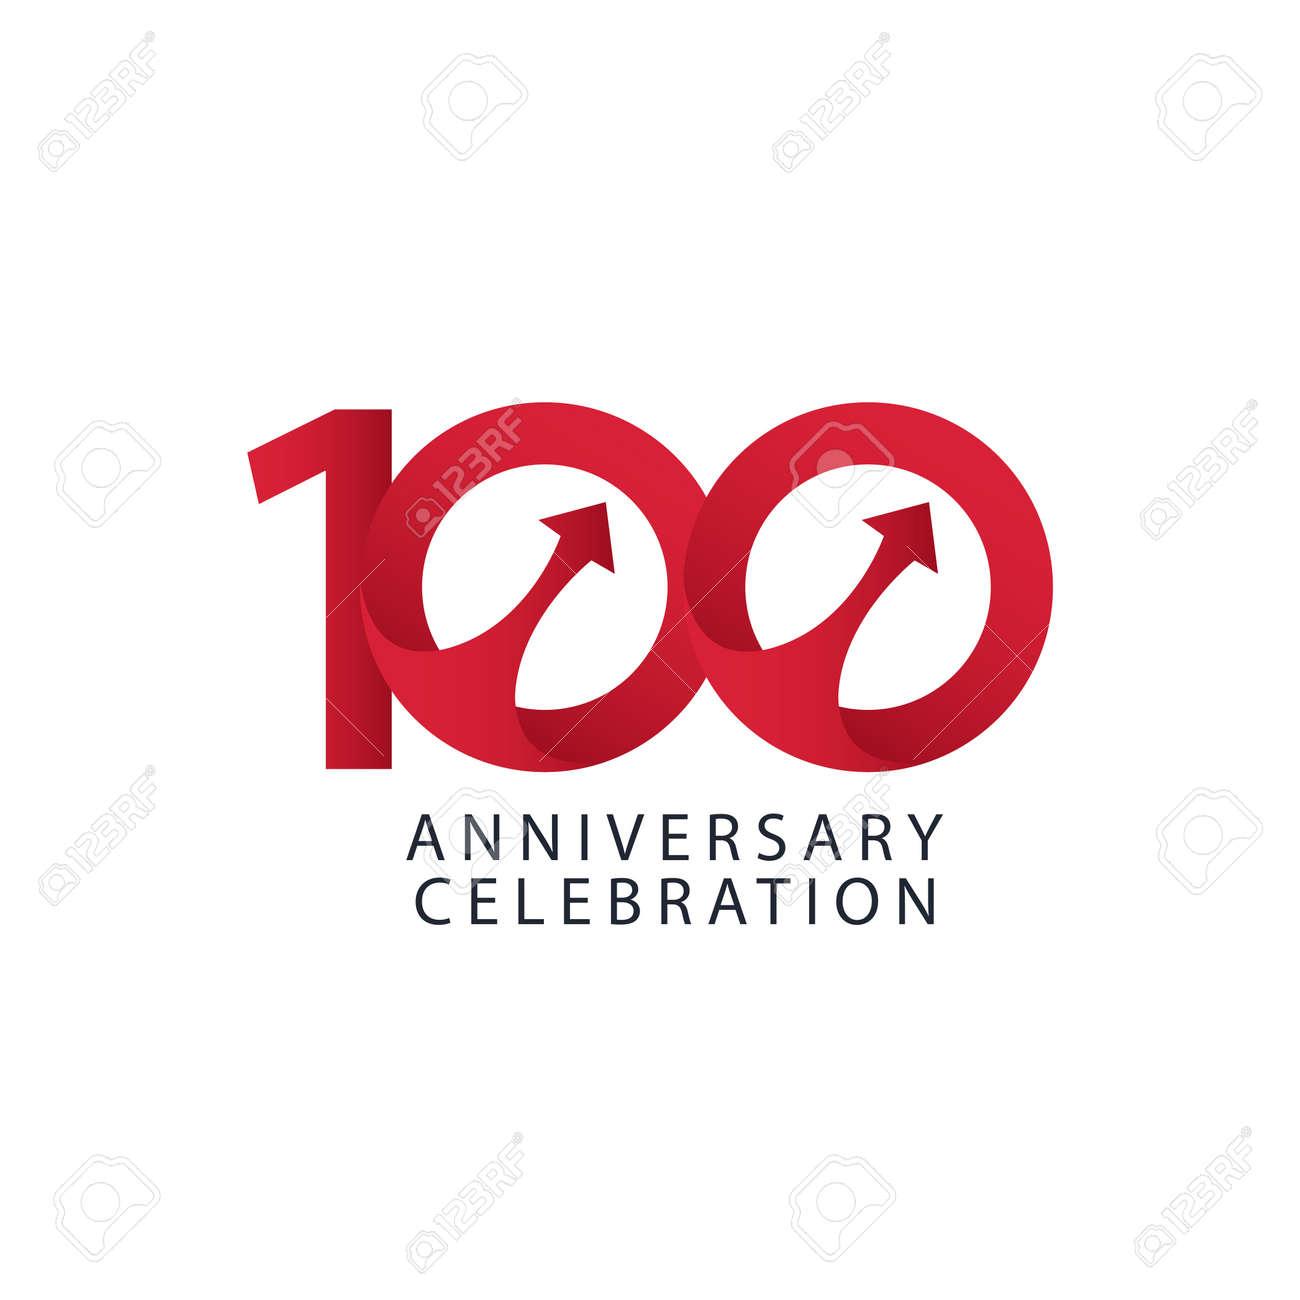 100 Years Anniversary Celebration Vector Template Design Illustration - 163698087